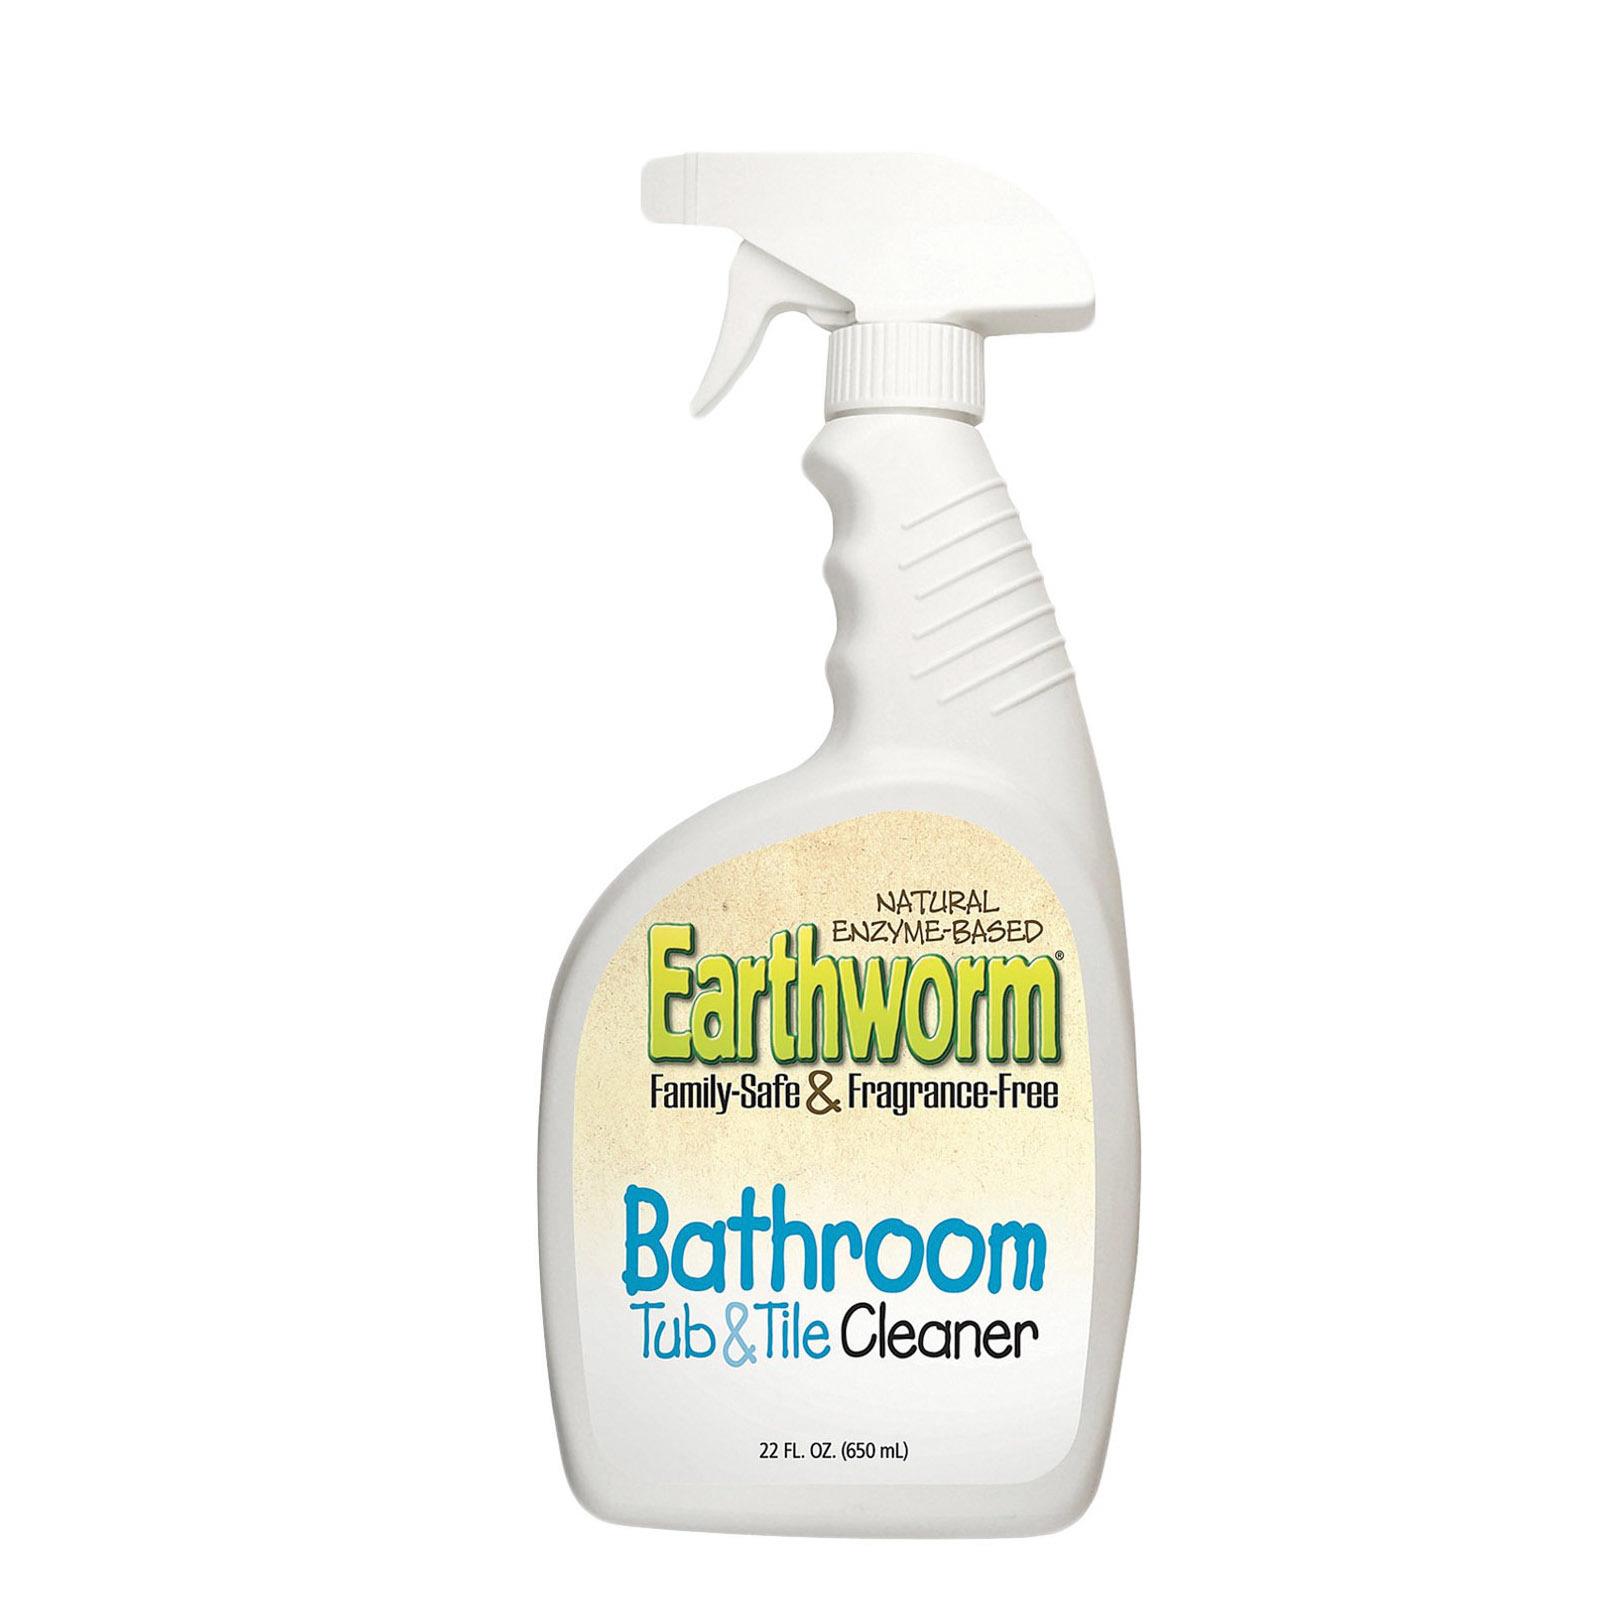 Earthworm Bathroom Tub and Tile Cleaner - Case of 6 - 22 FL oz.